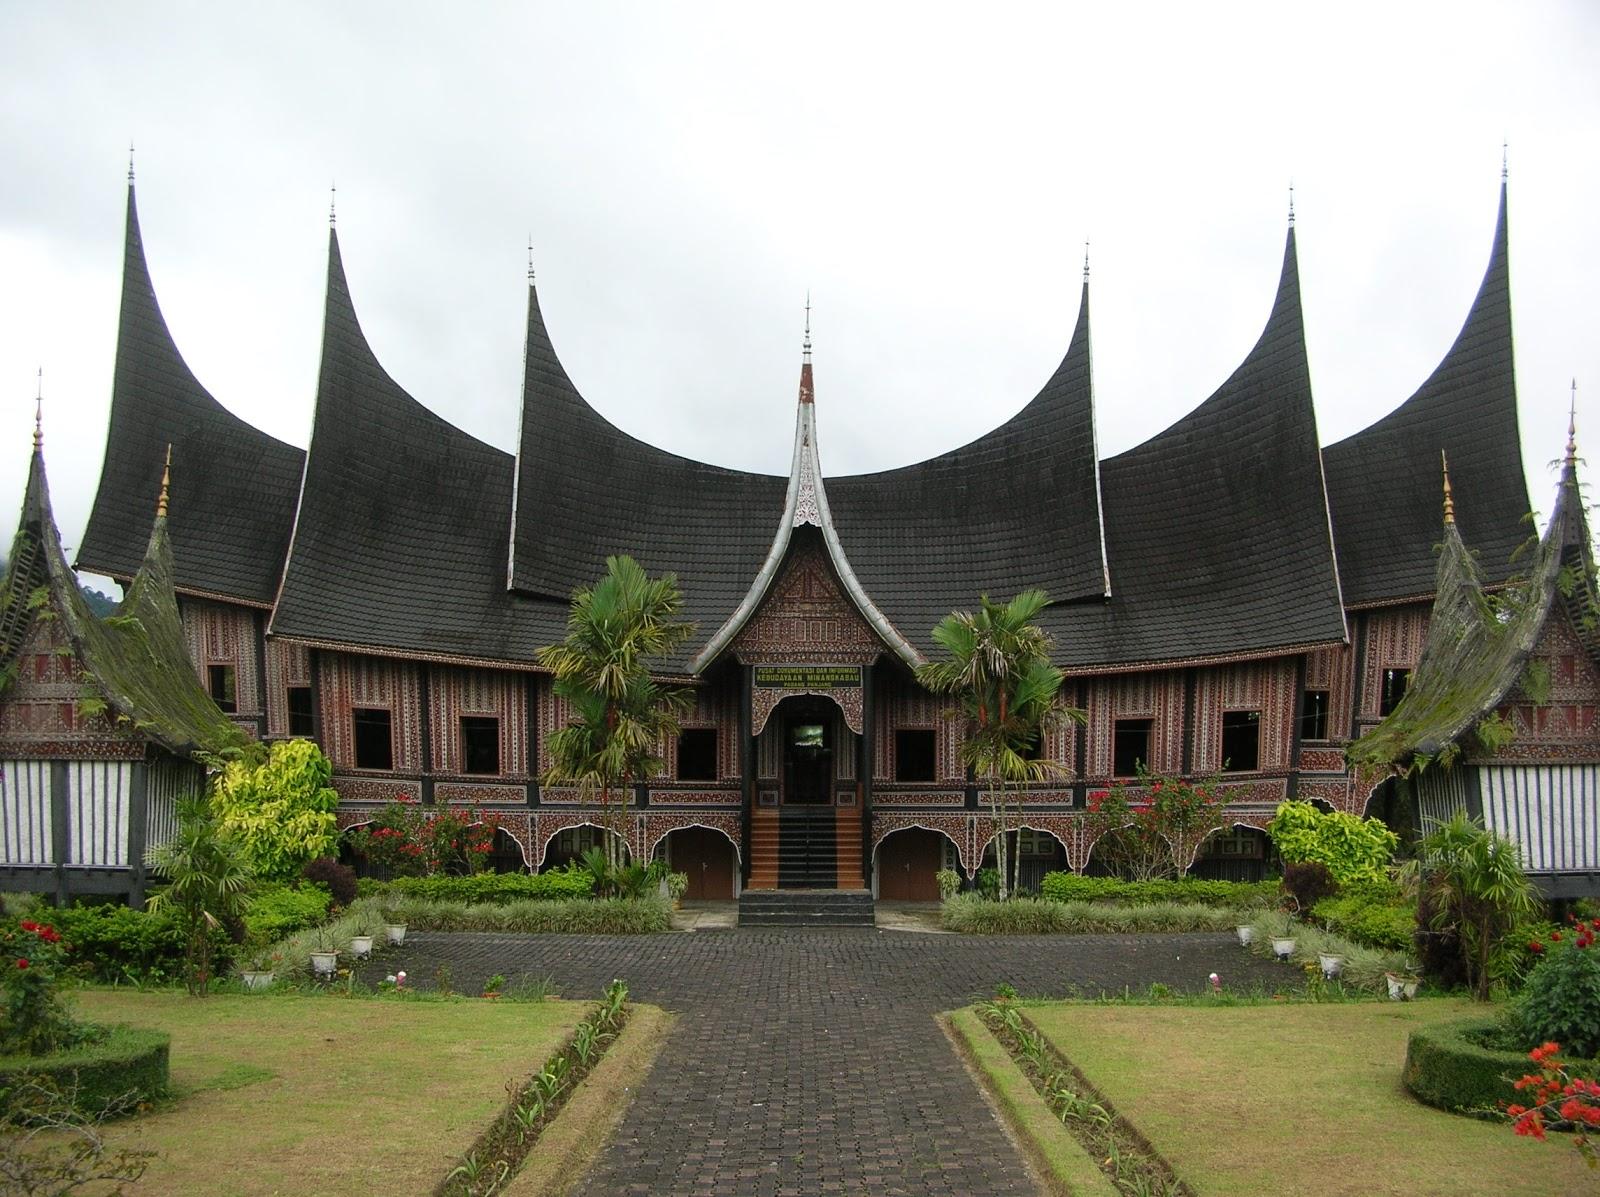 Rumah Tradisional Minangkabau